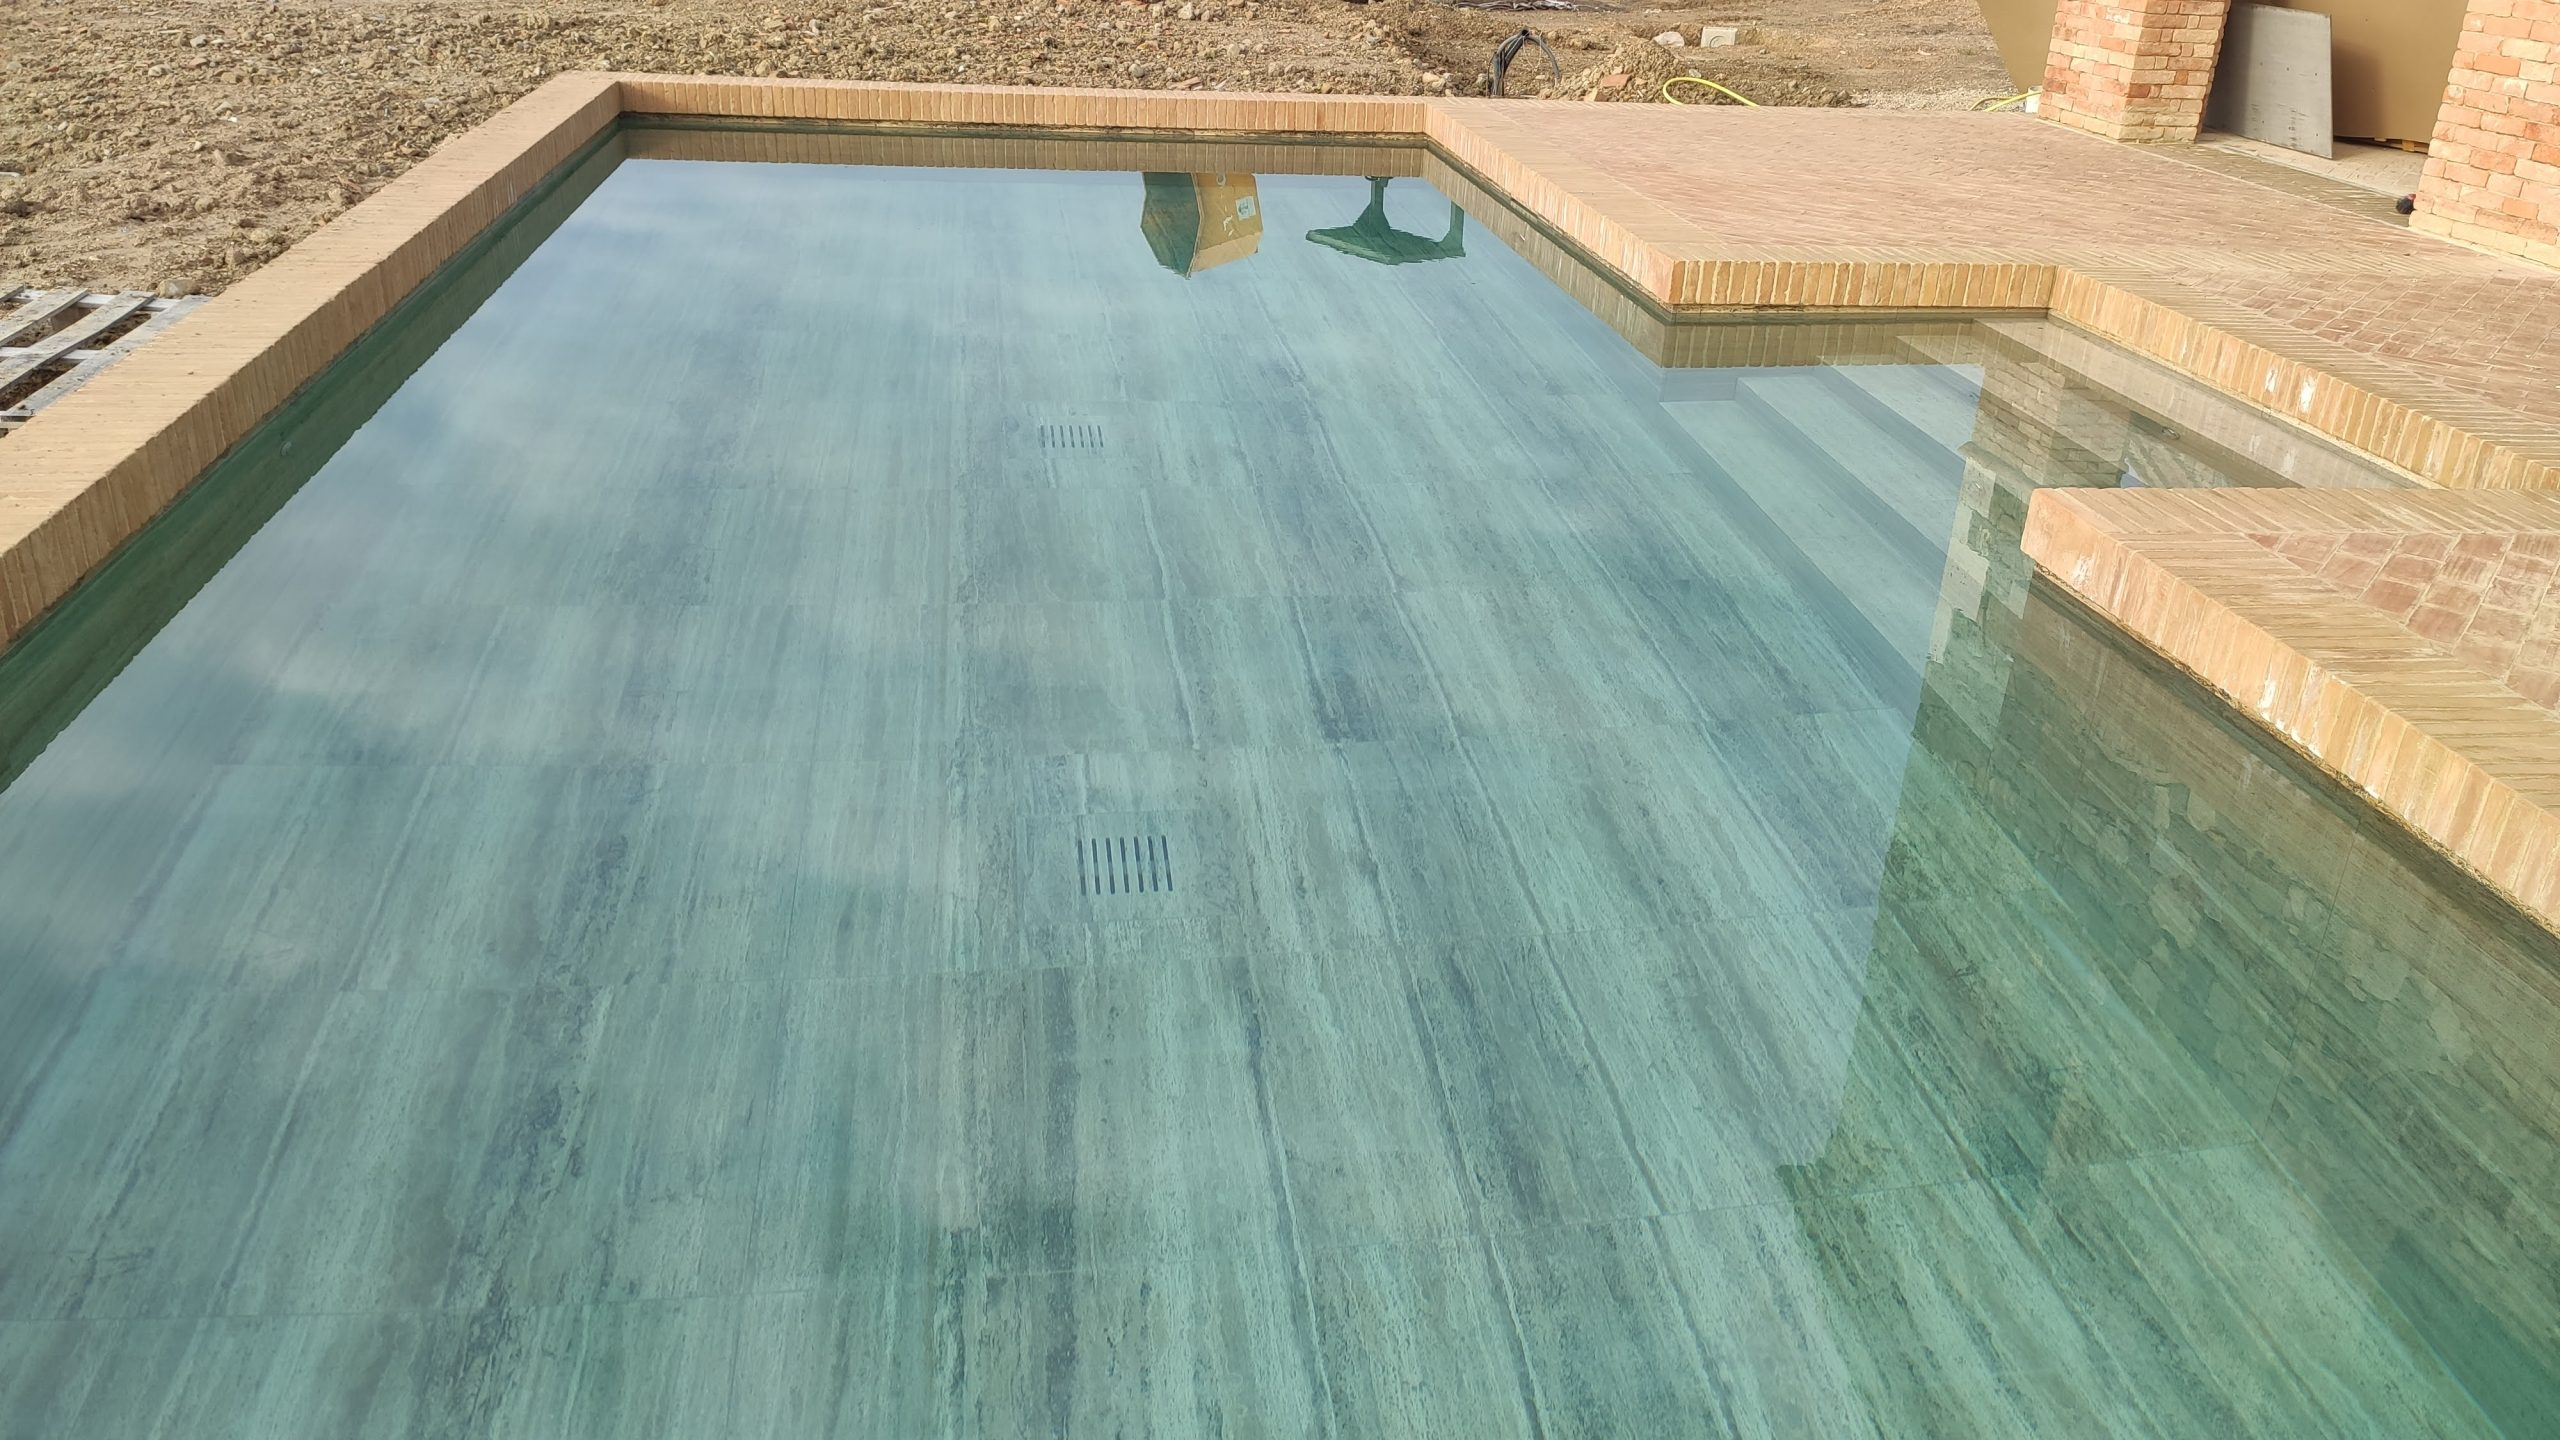 Pdr zebra terra chiara travertino interno piscina